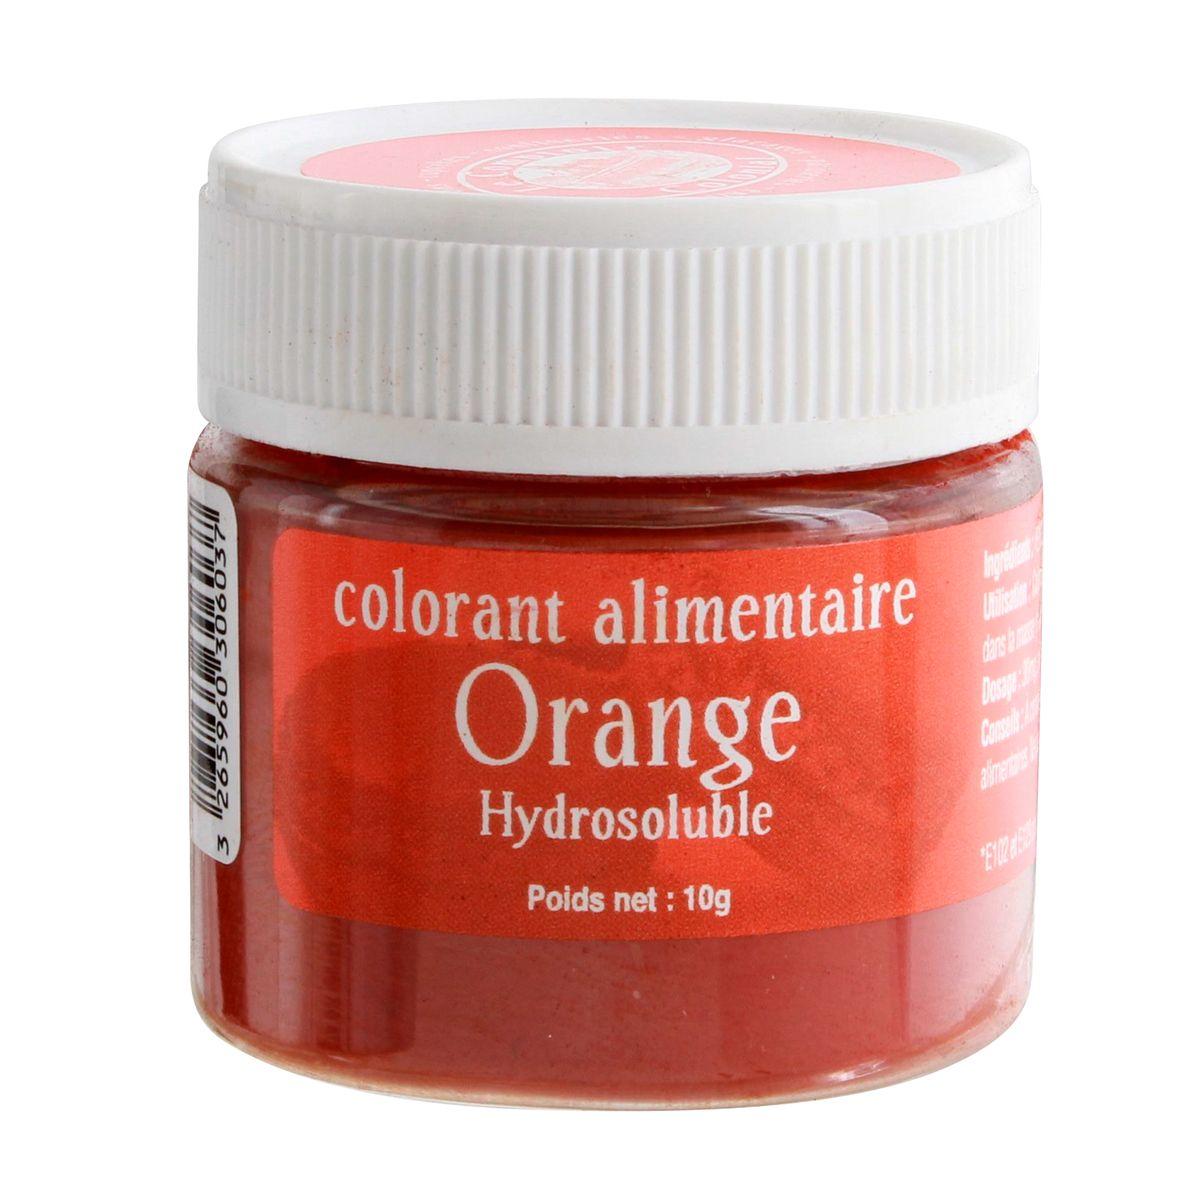 Colorant alimentaire hydrosoluble 10gr orange - Le Comptoir Colonial